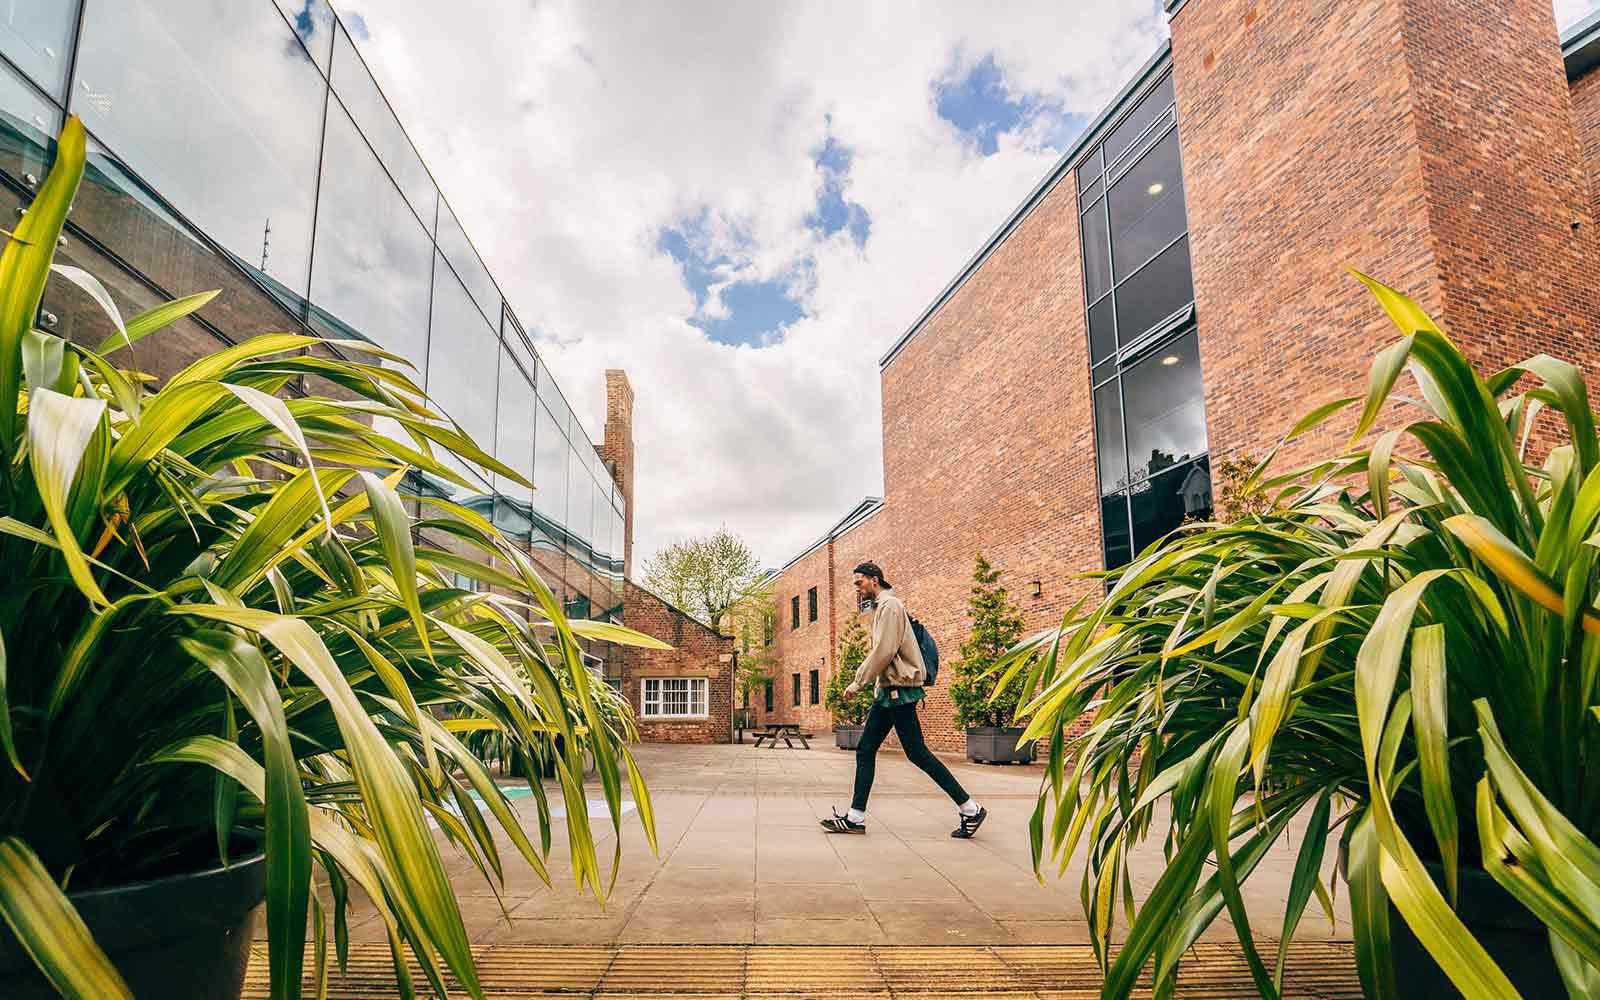 Student walking across campus